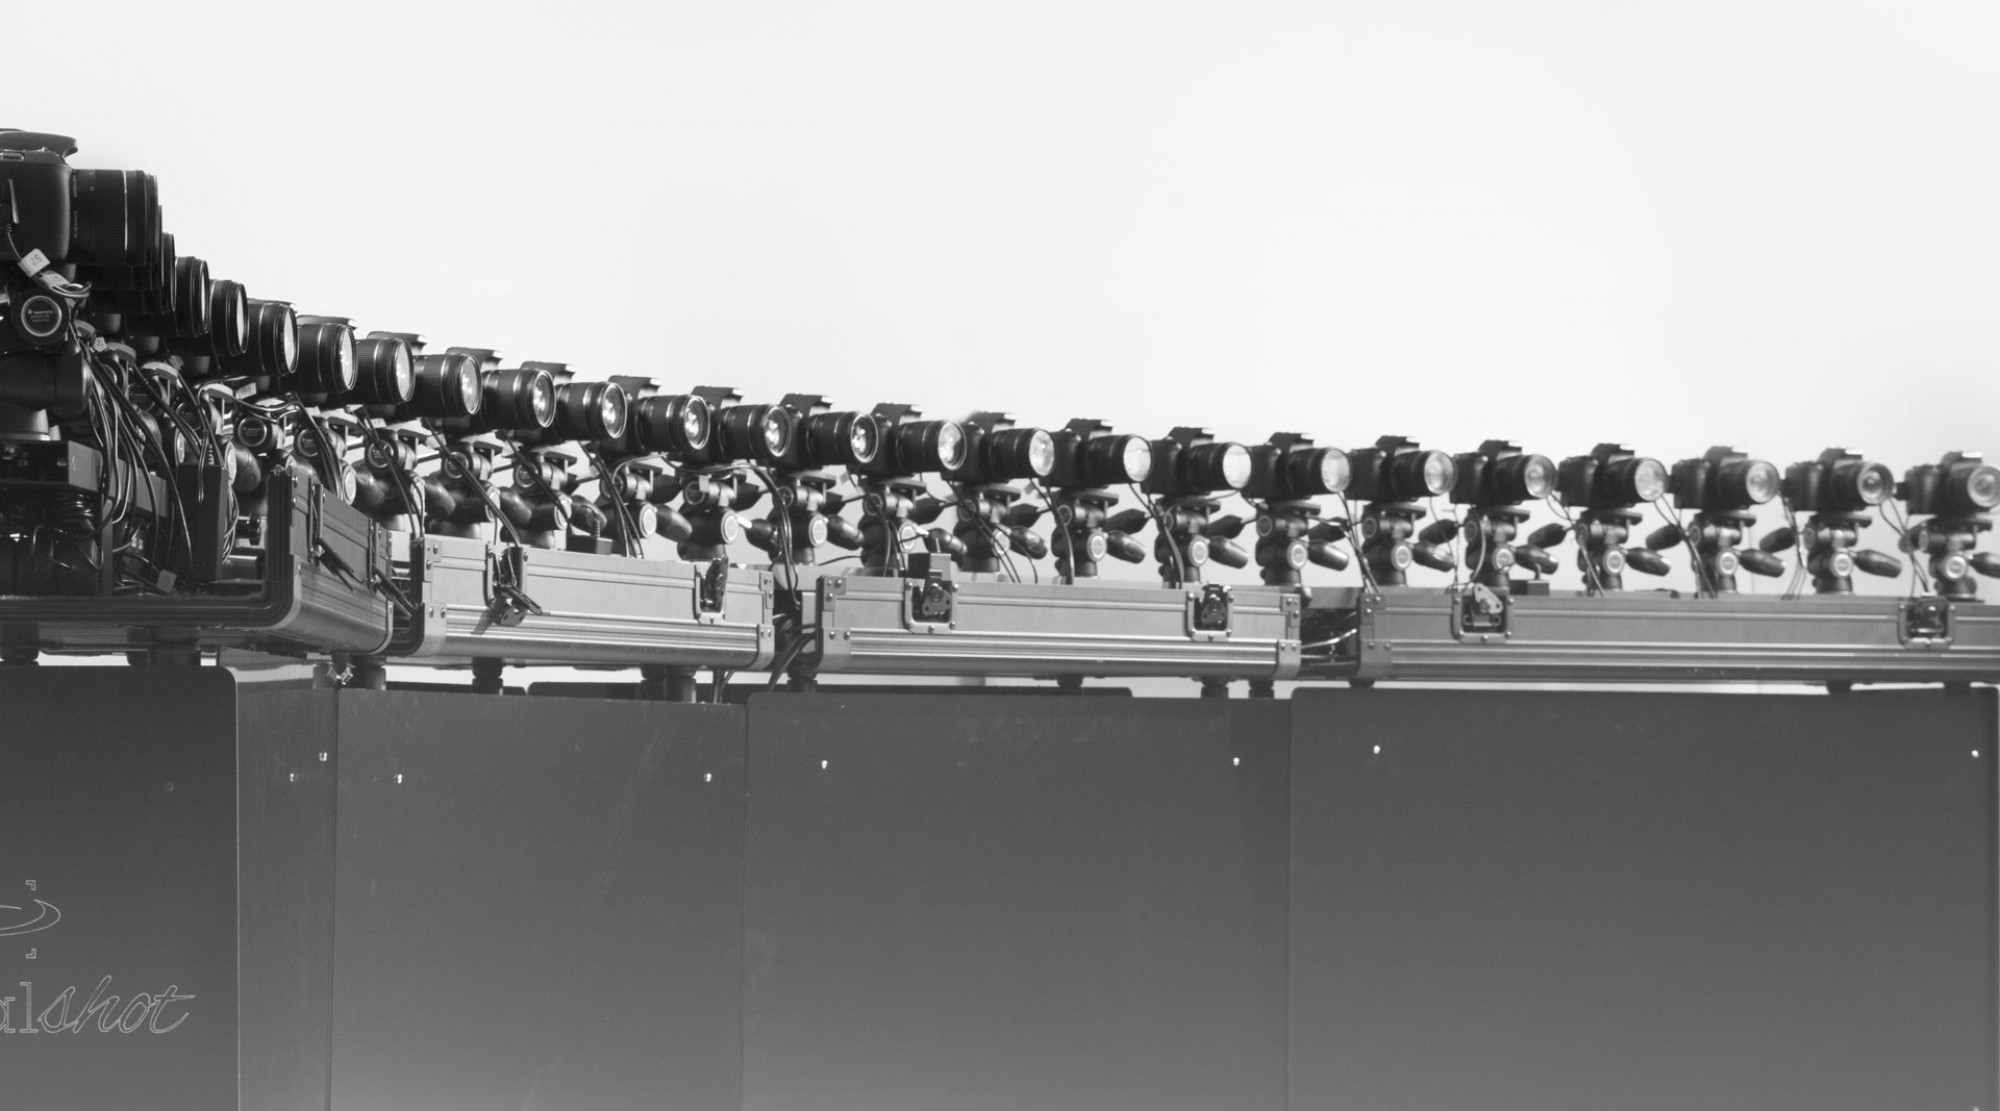 Effetto bullet time fluido con 25 fotocamere